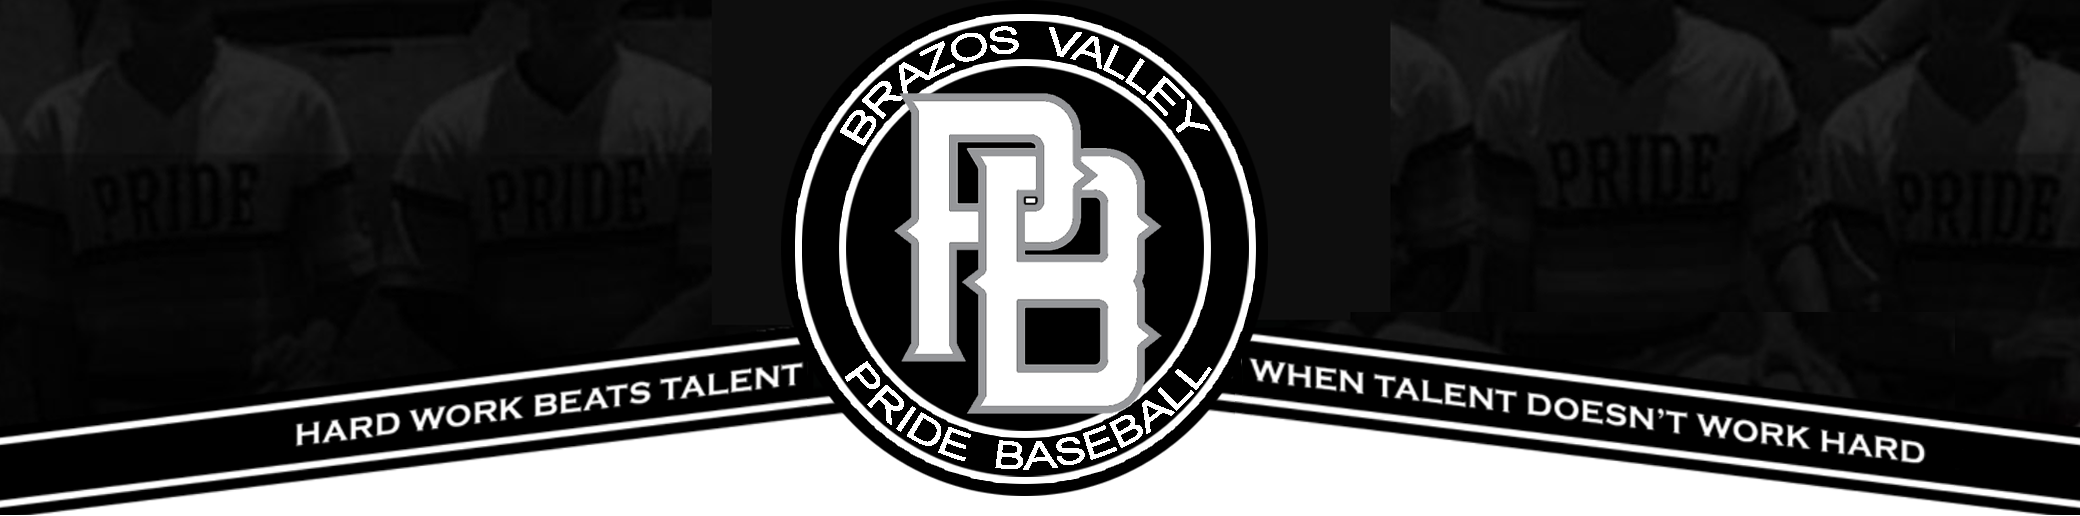 Pride new logo banner